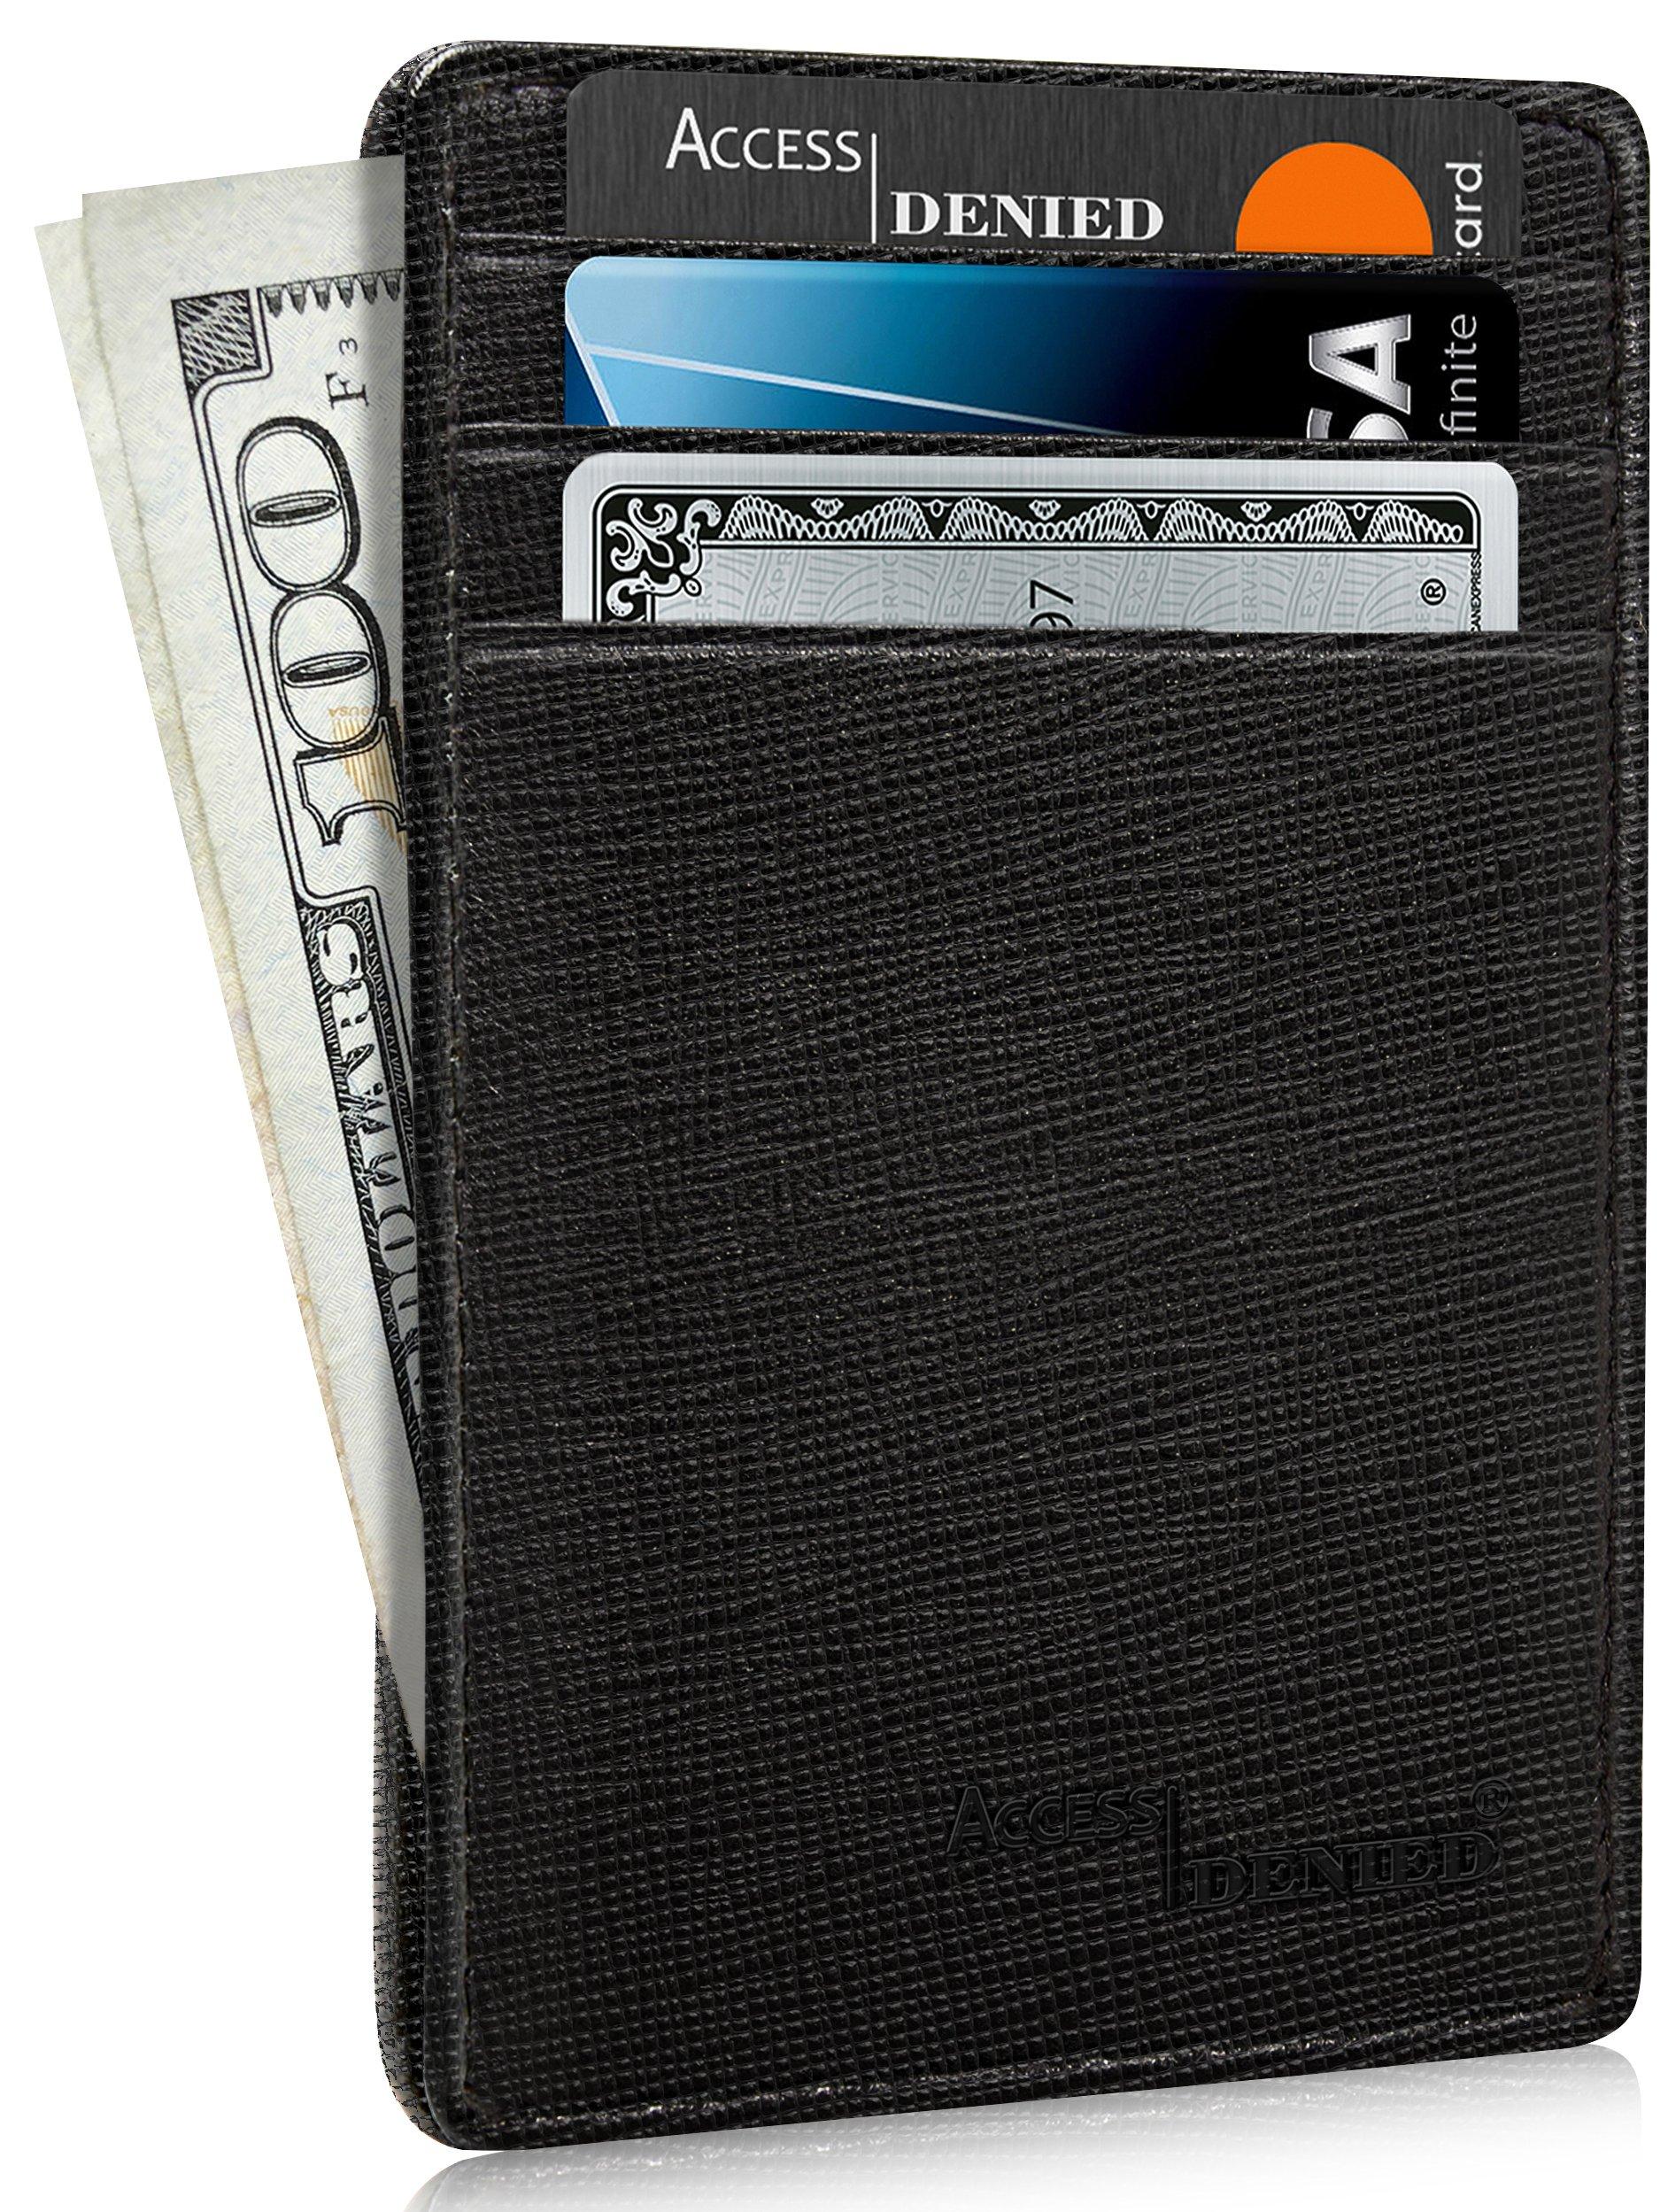 Slim Minimalist Wallets for Men & Women - Front Pocket Wallet RFID Blocking Card Holder